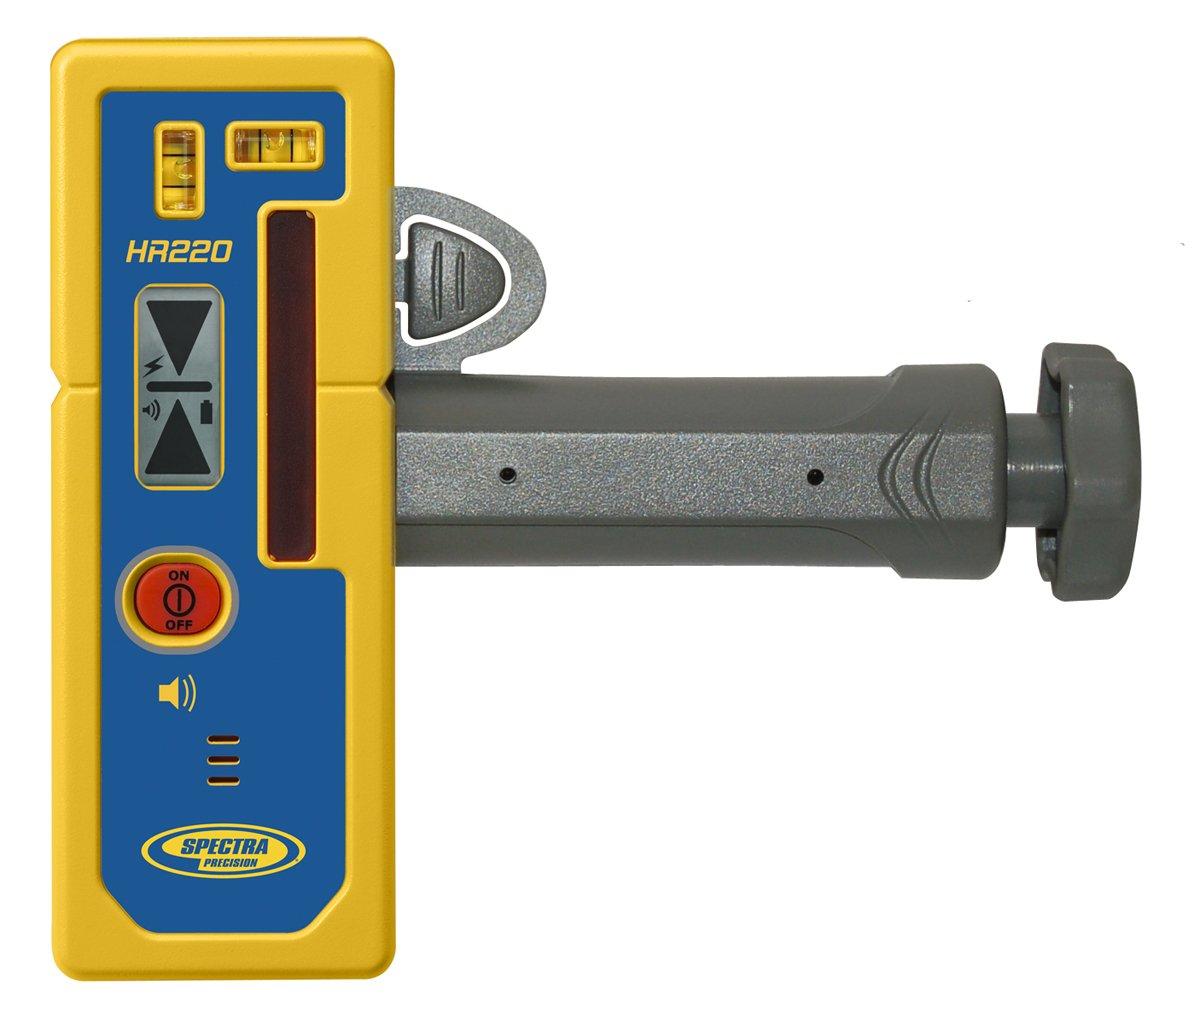 Spectra Precision HR220 Laser Receiver